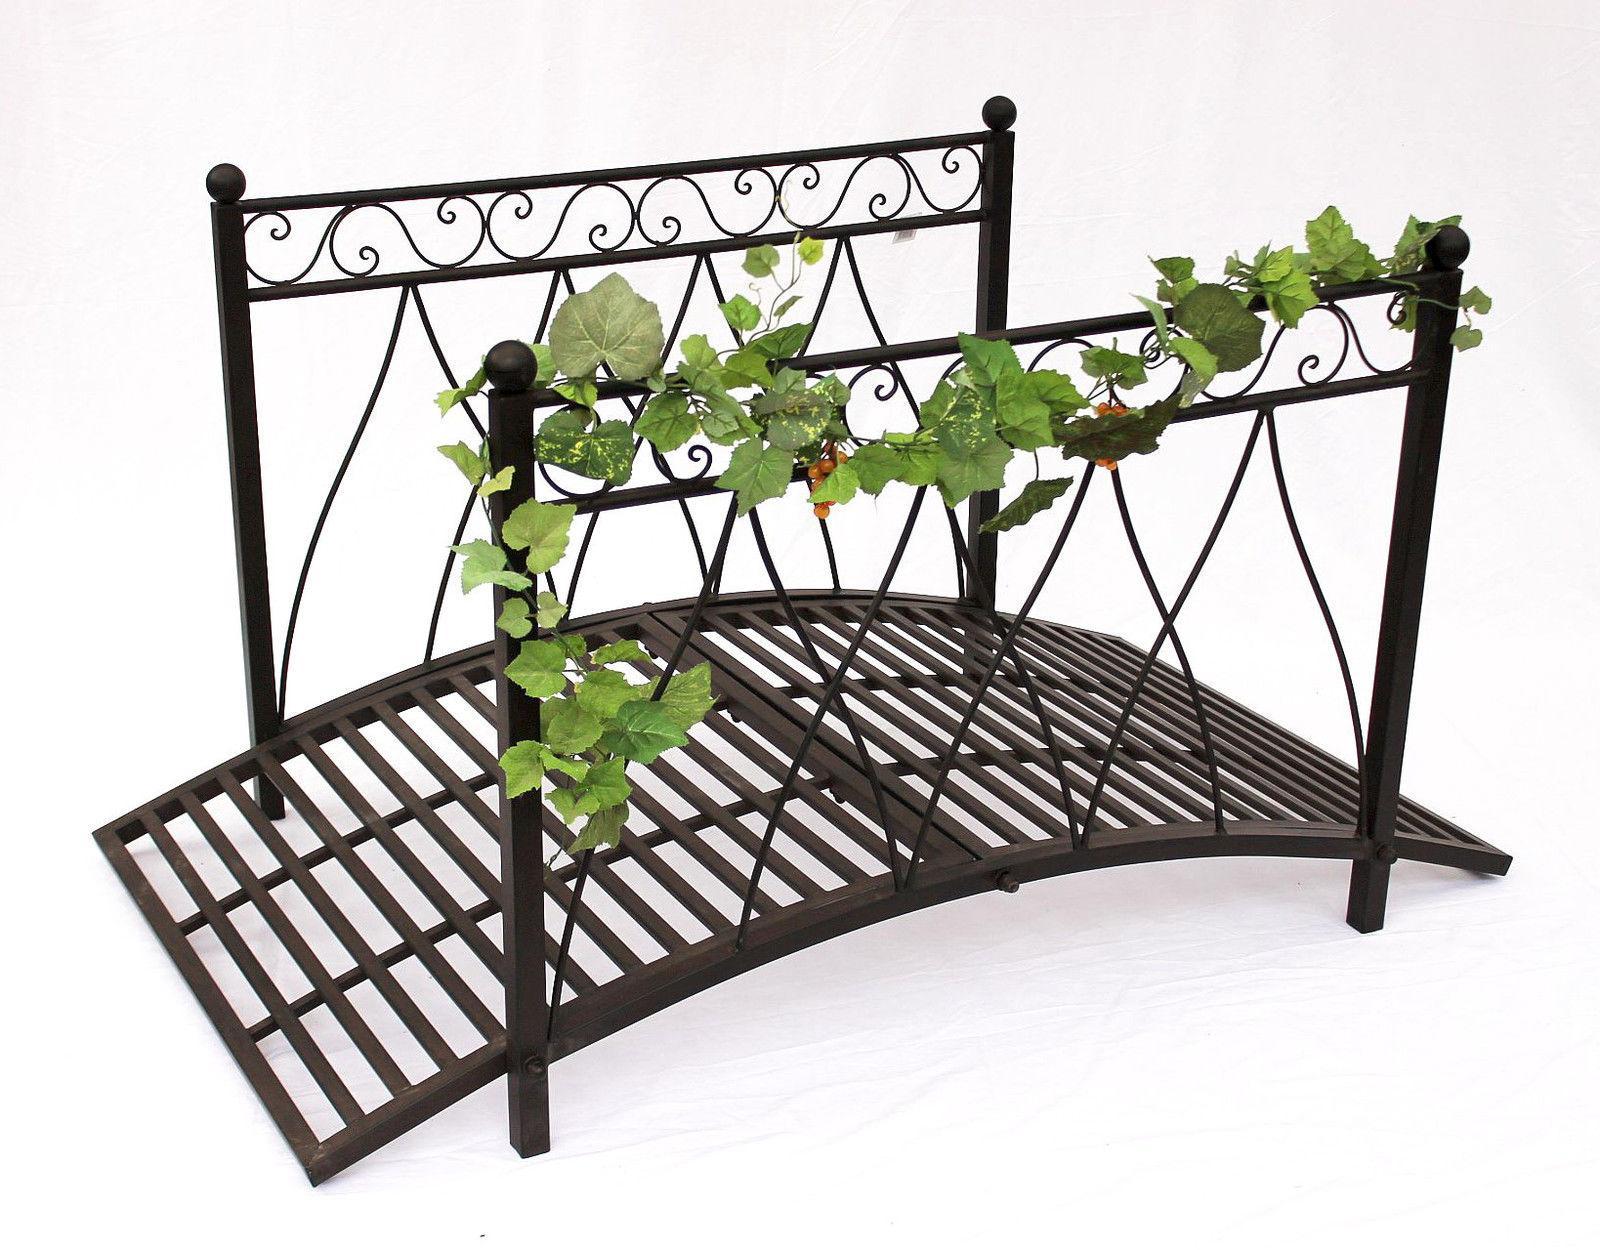 ponte in metallo 111252 eisenbr cke 145 cm giardino metallbr cke decorazione ebay. Black Bedroom Furniture Sets. Home Design Ideas